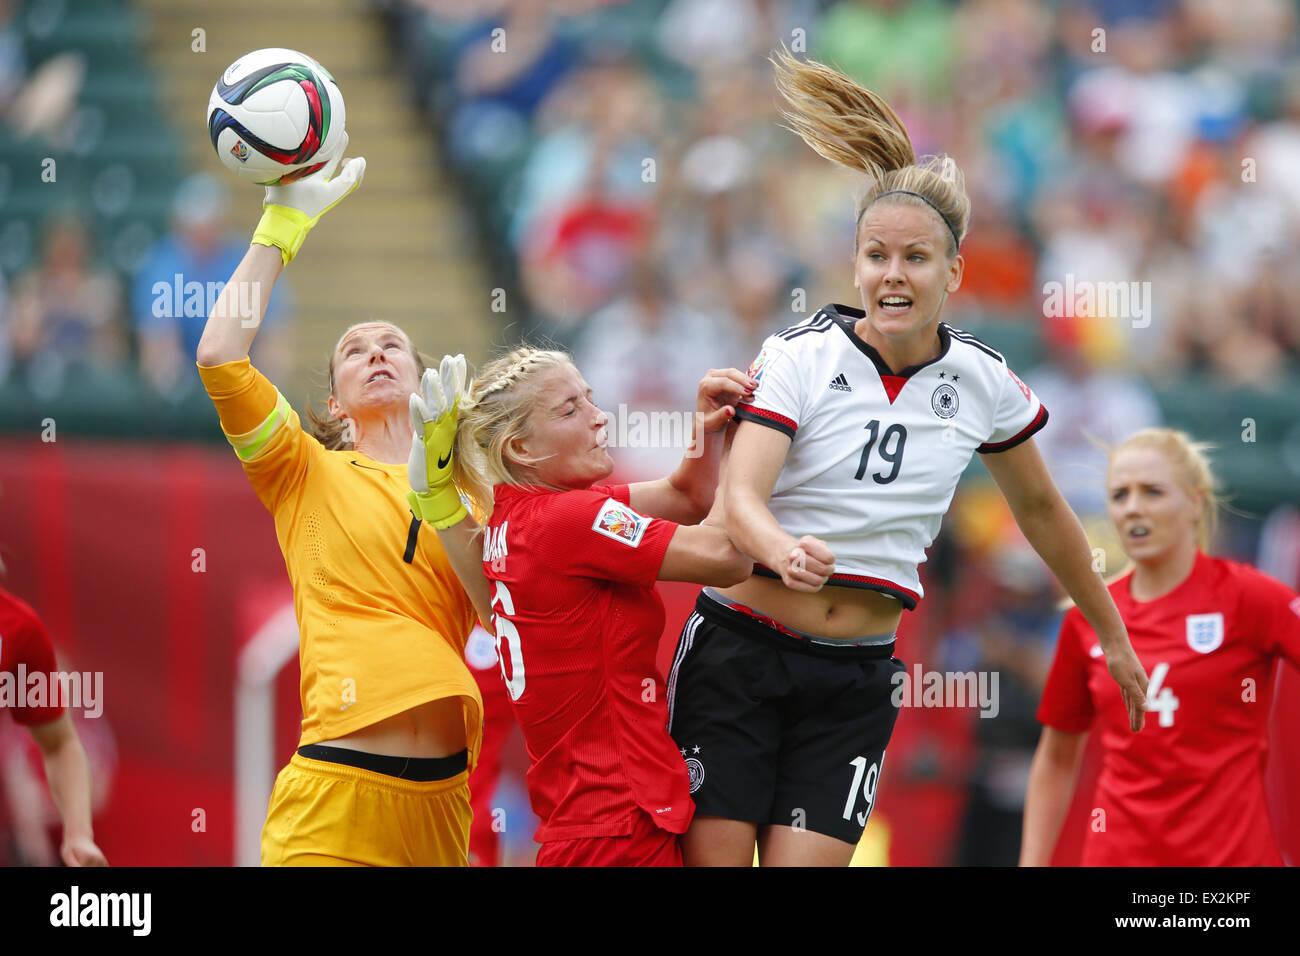 Edmonton, Canada. 4 juillet, 2015. (L-R) Karen Bardsley, Katie Chapman (FRA), Lena Petermann (GER) Football/soccer: Photo Stock